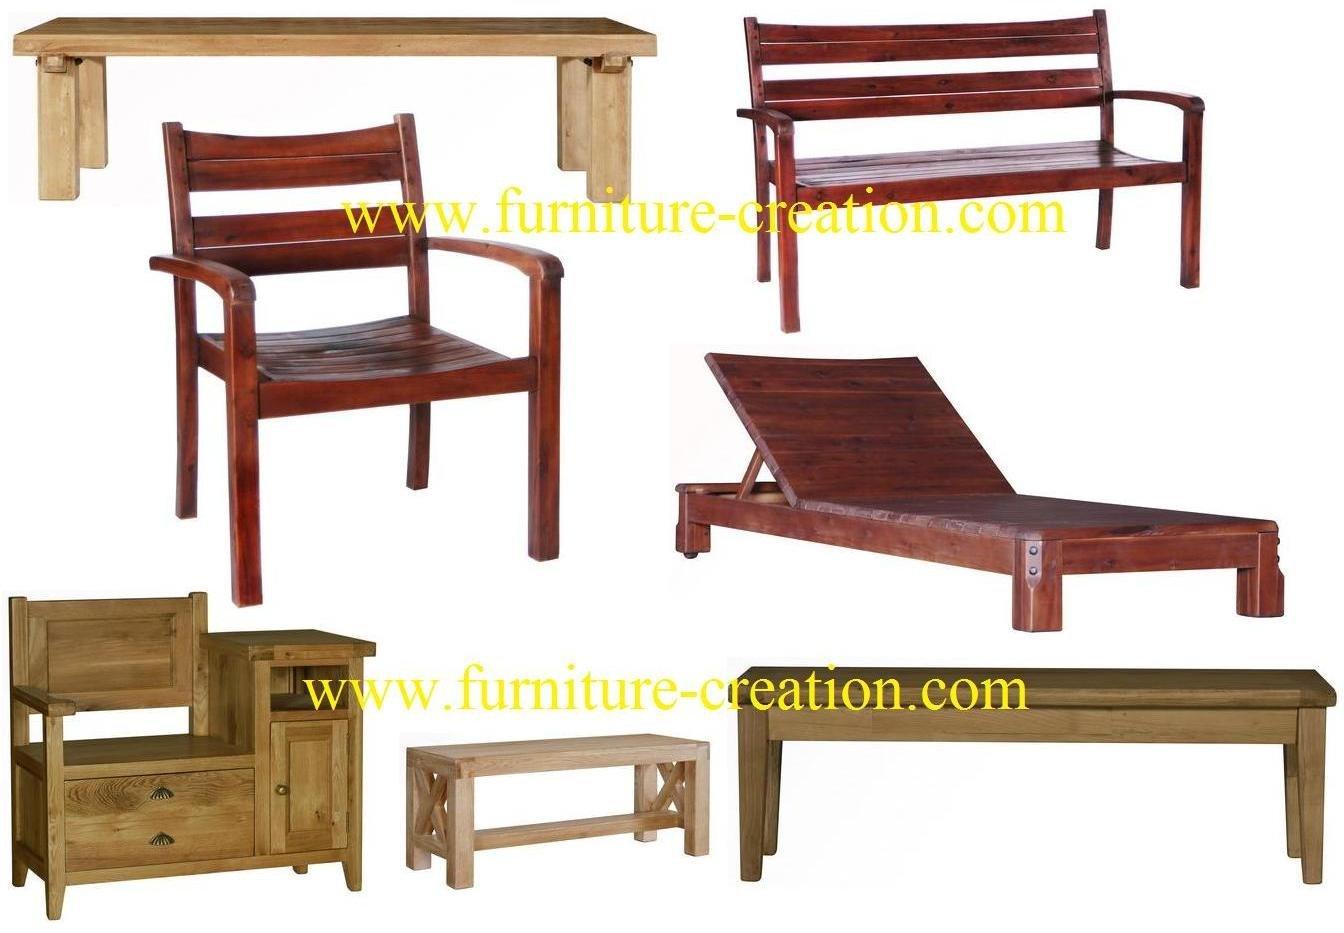 Outdoor Solid Wood Furniture Buy Outdoor Furniture